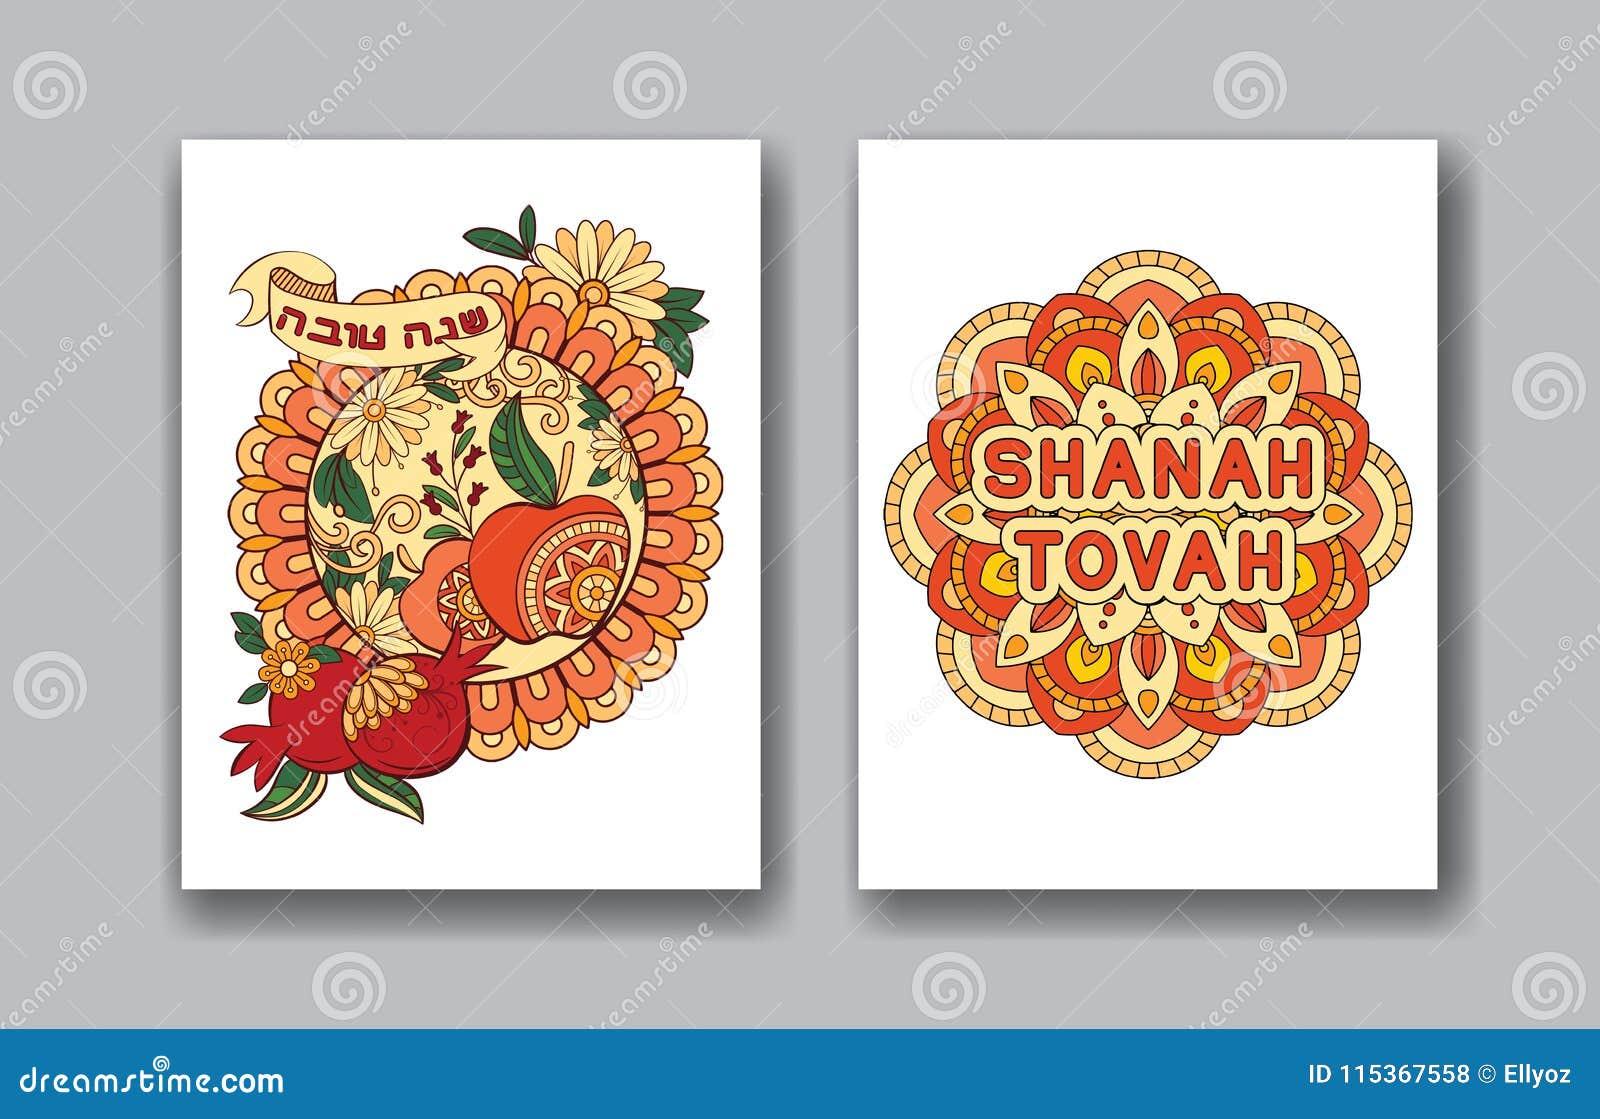 Rosh hashanah greeting card stock vector illustration of apple rosh hashanah greeting card royalty free vector m4hsunfo